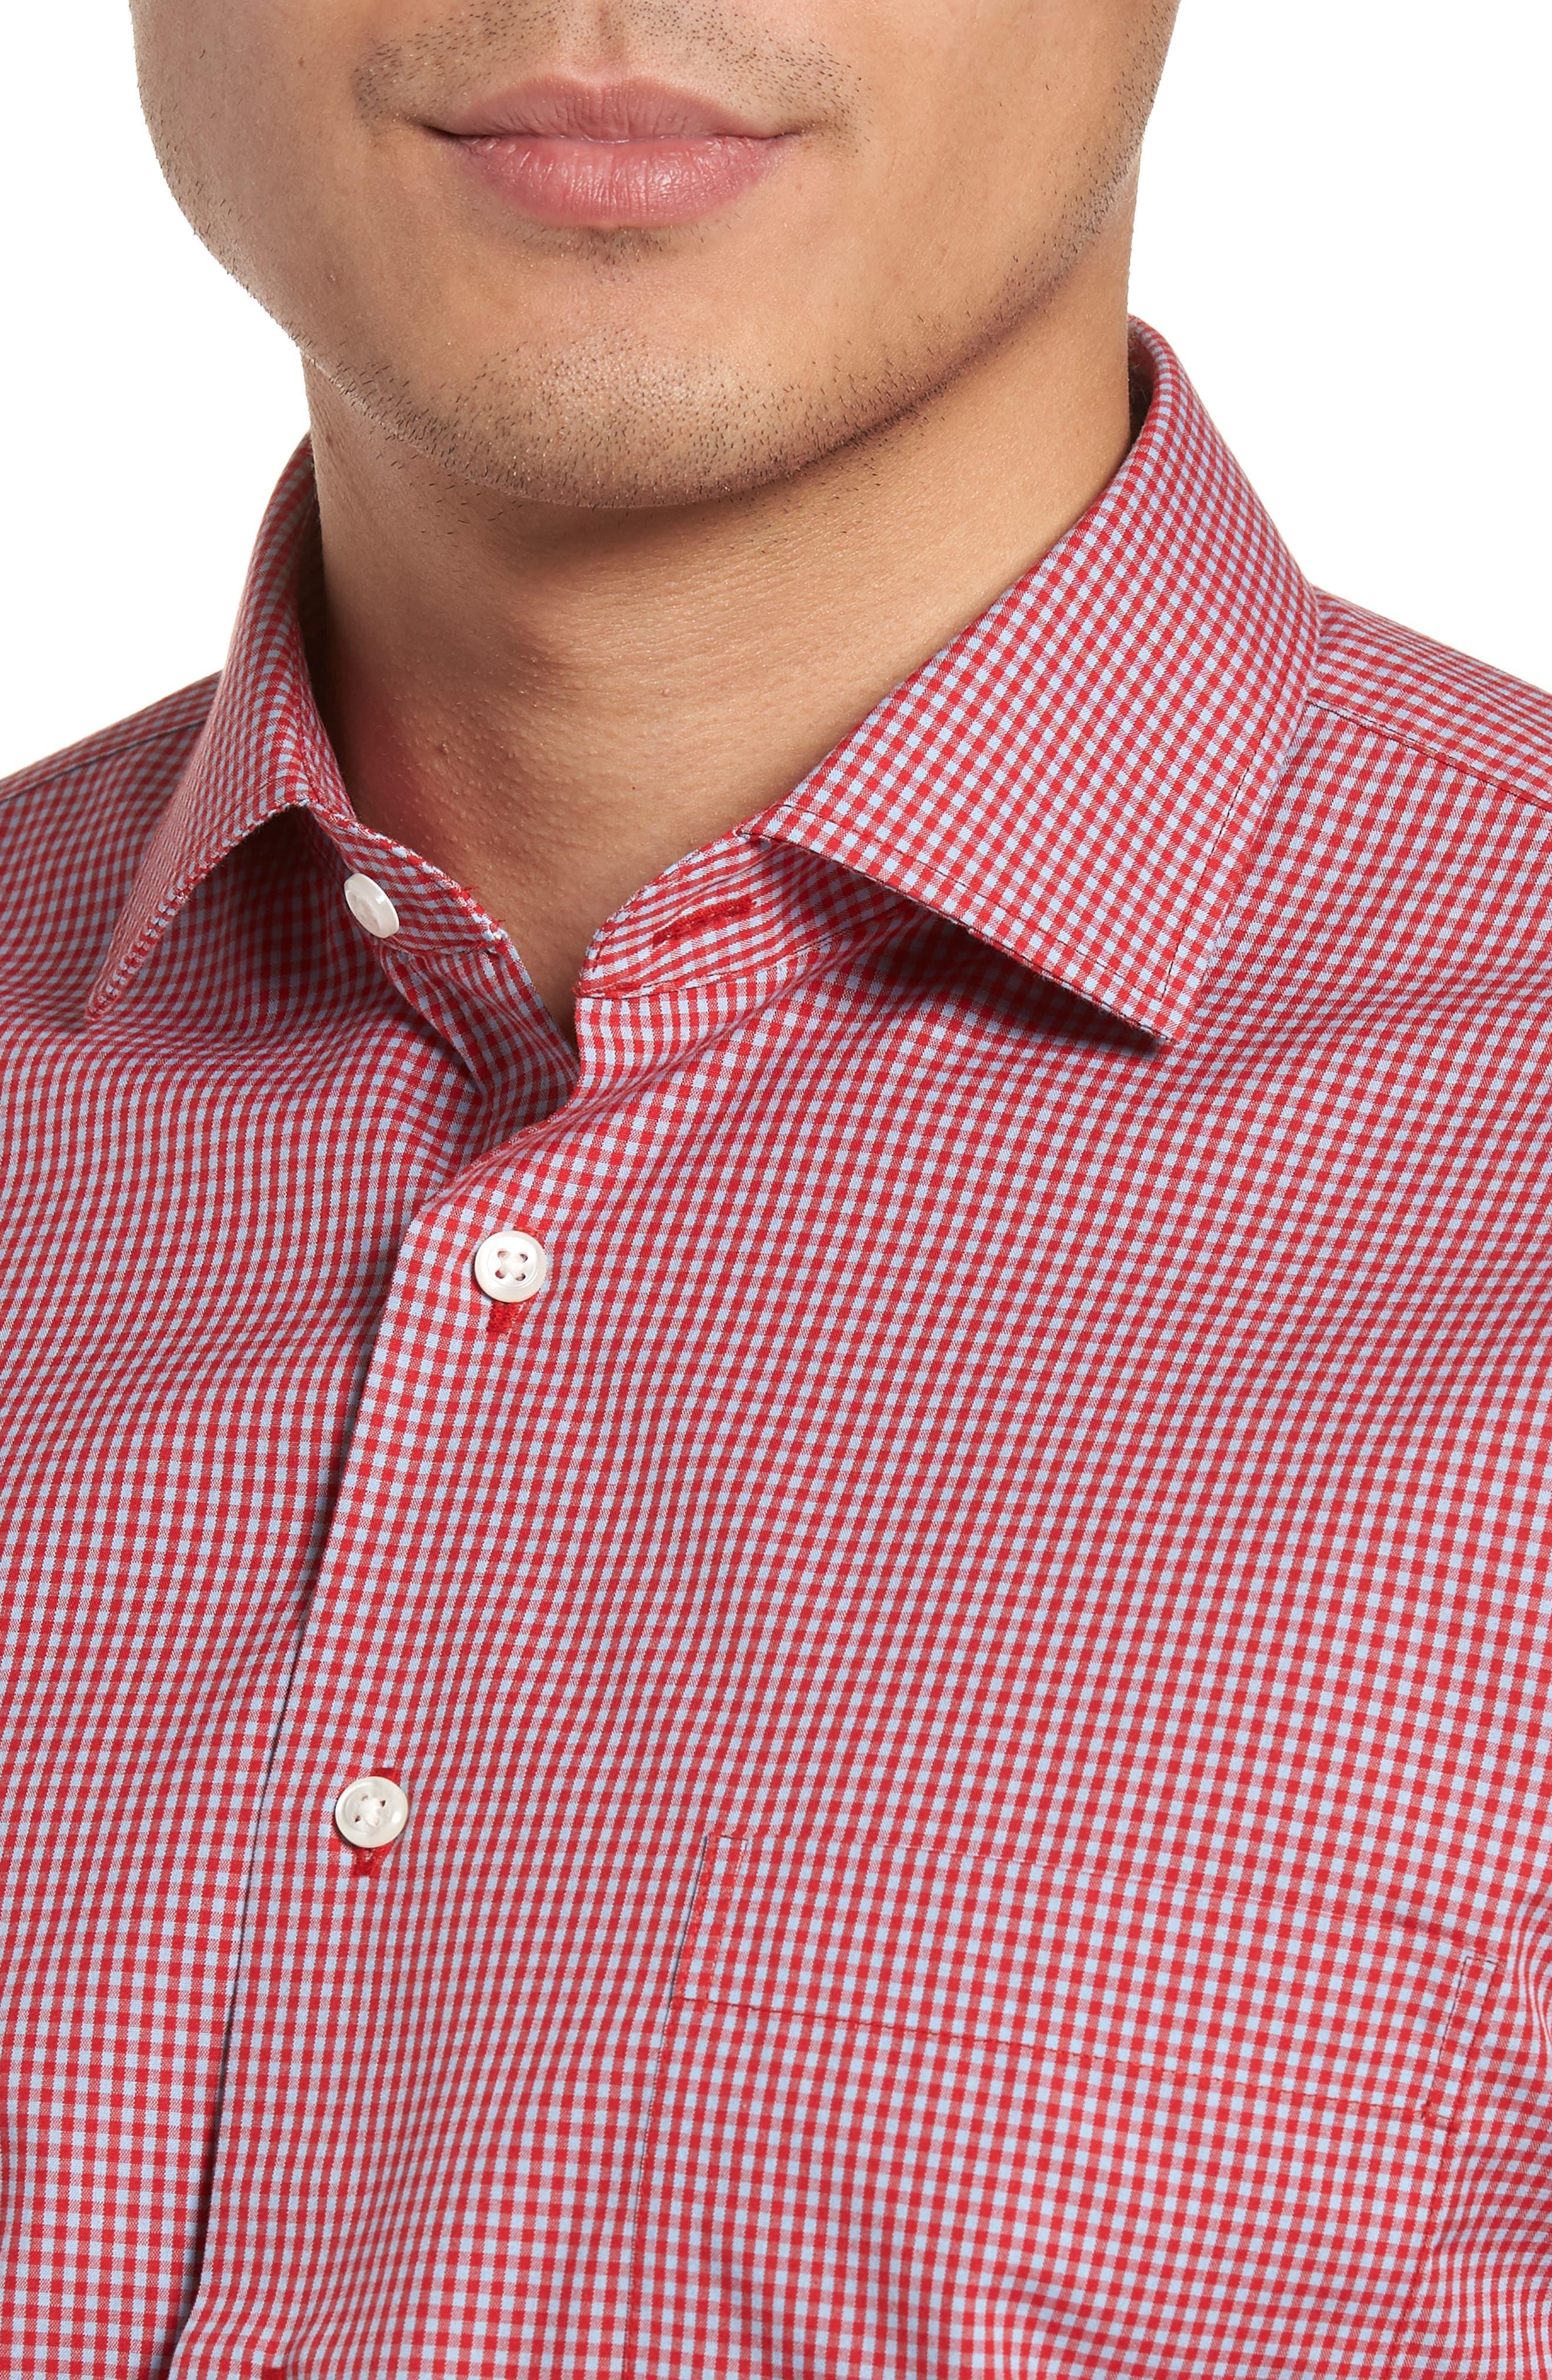 Smartcare<sup>™</sup> Trim Fit Check Dress Shirt,                             Alternate thumbnail 2, color,                             Red Barbados